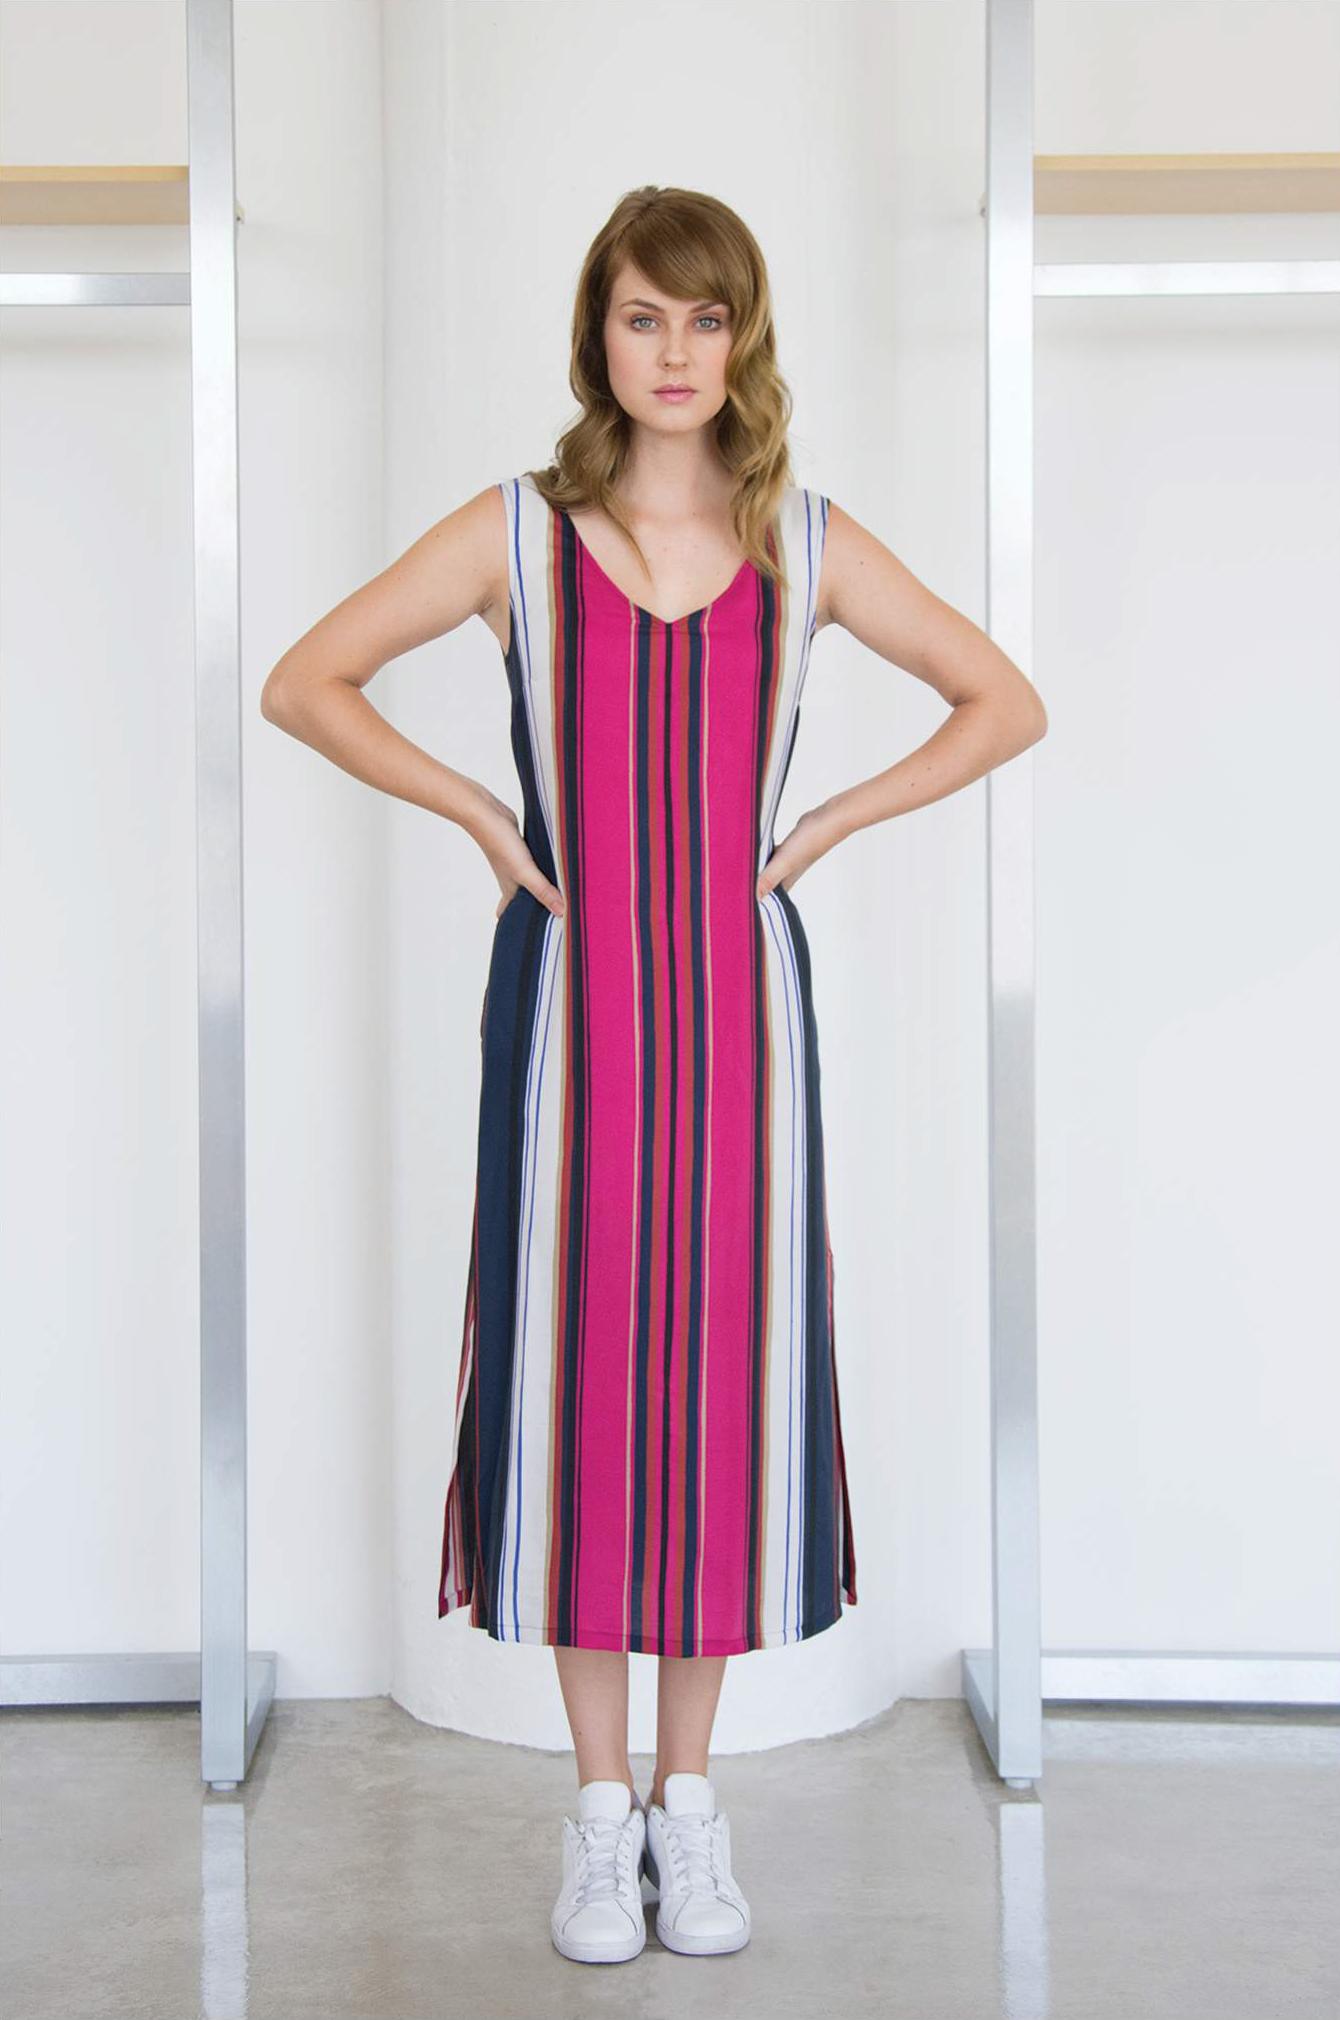 Dress: Geneva - SANTORELLI